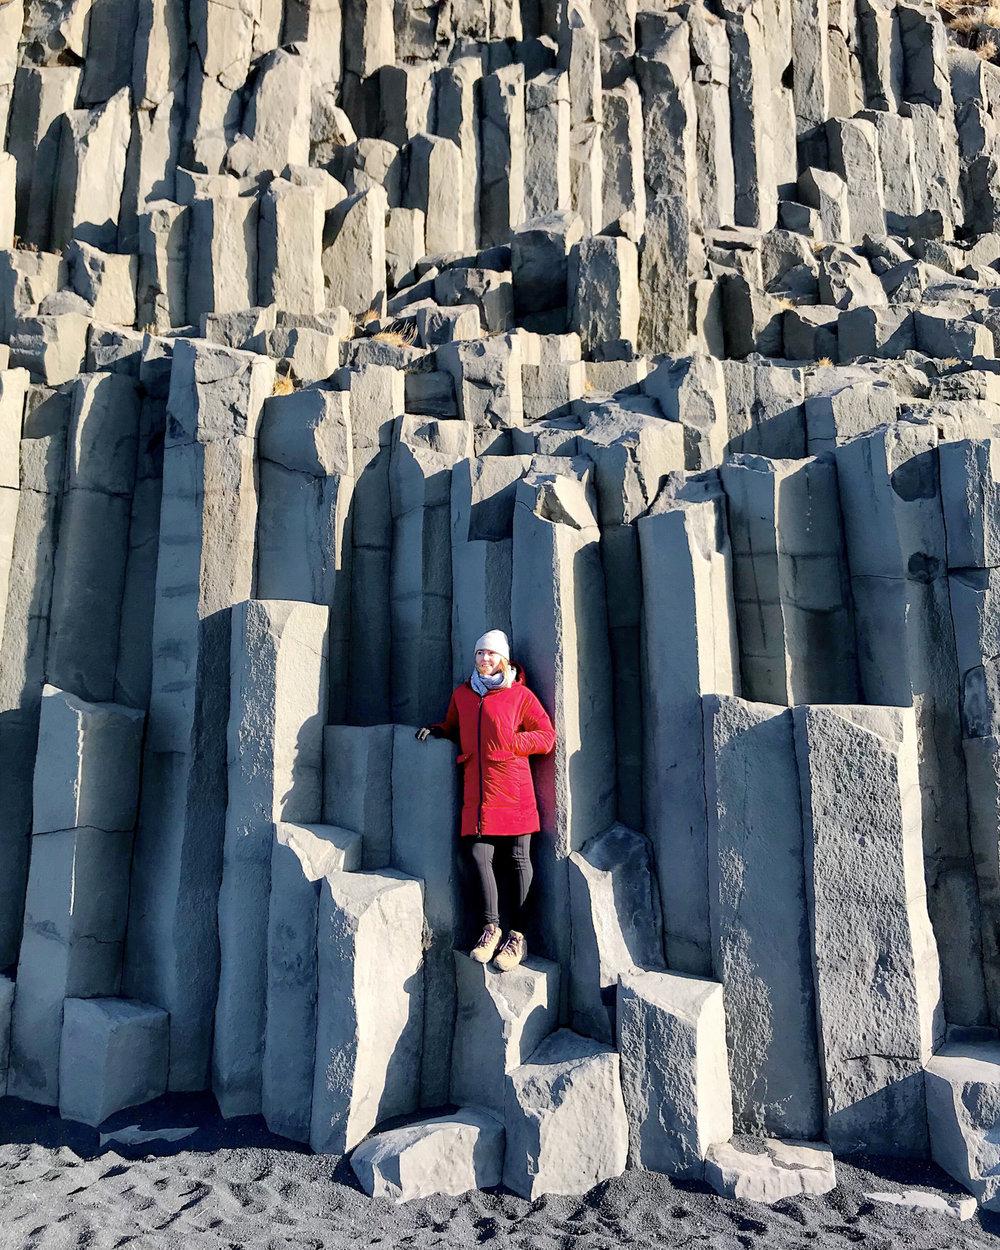 The white cliffs of Reynisfjara beach.